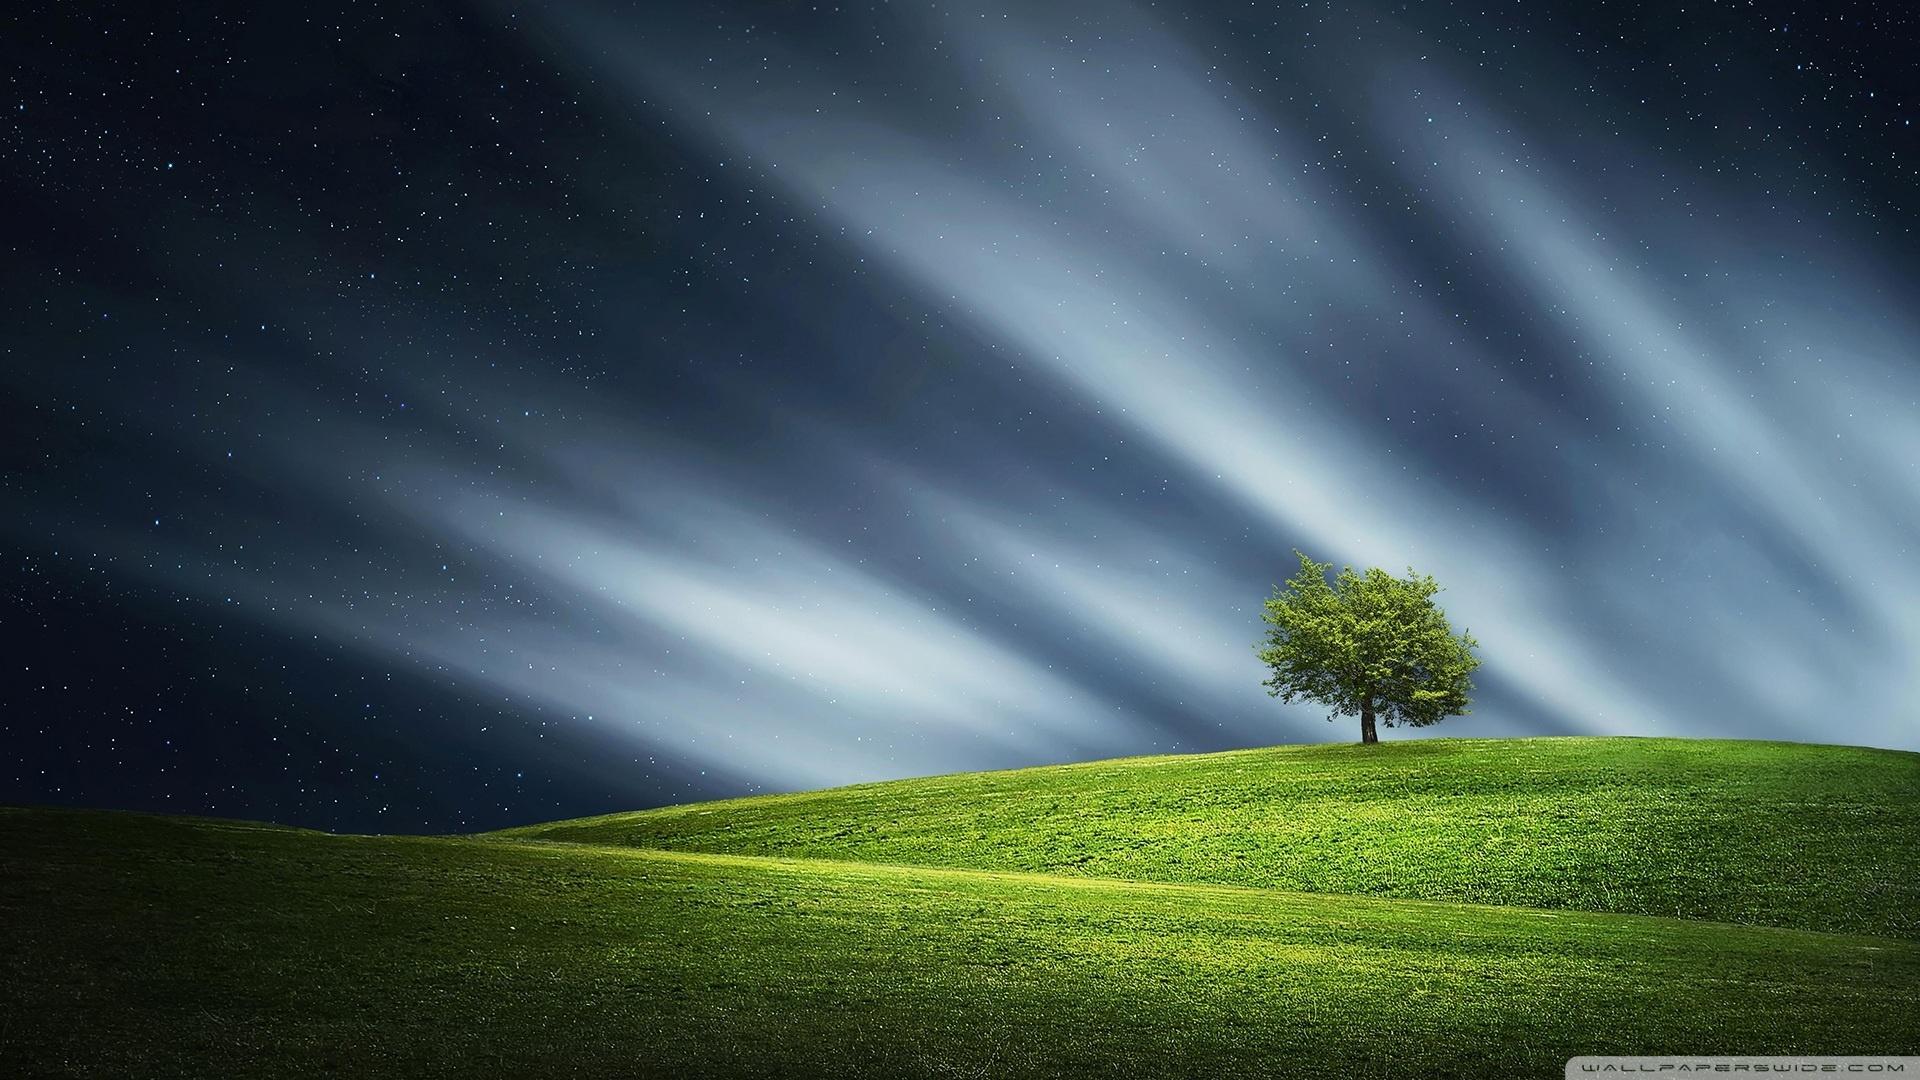 Hd 3d Nature Wallpapers 1080p Widescreen Lone Tree 4k Hd Desktop Wallpaper For 4k Ultra Hd Tv